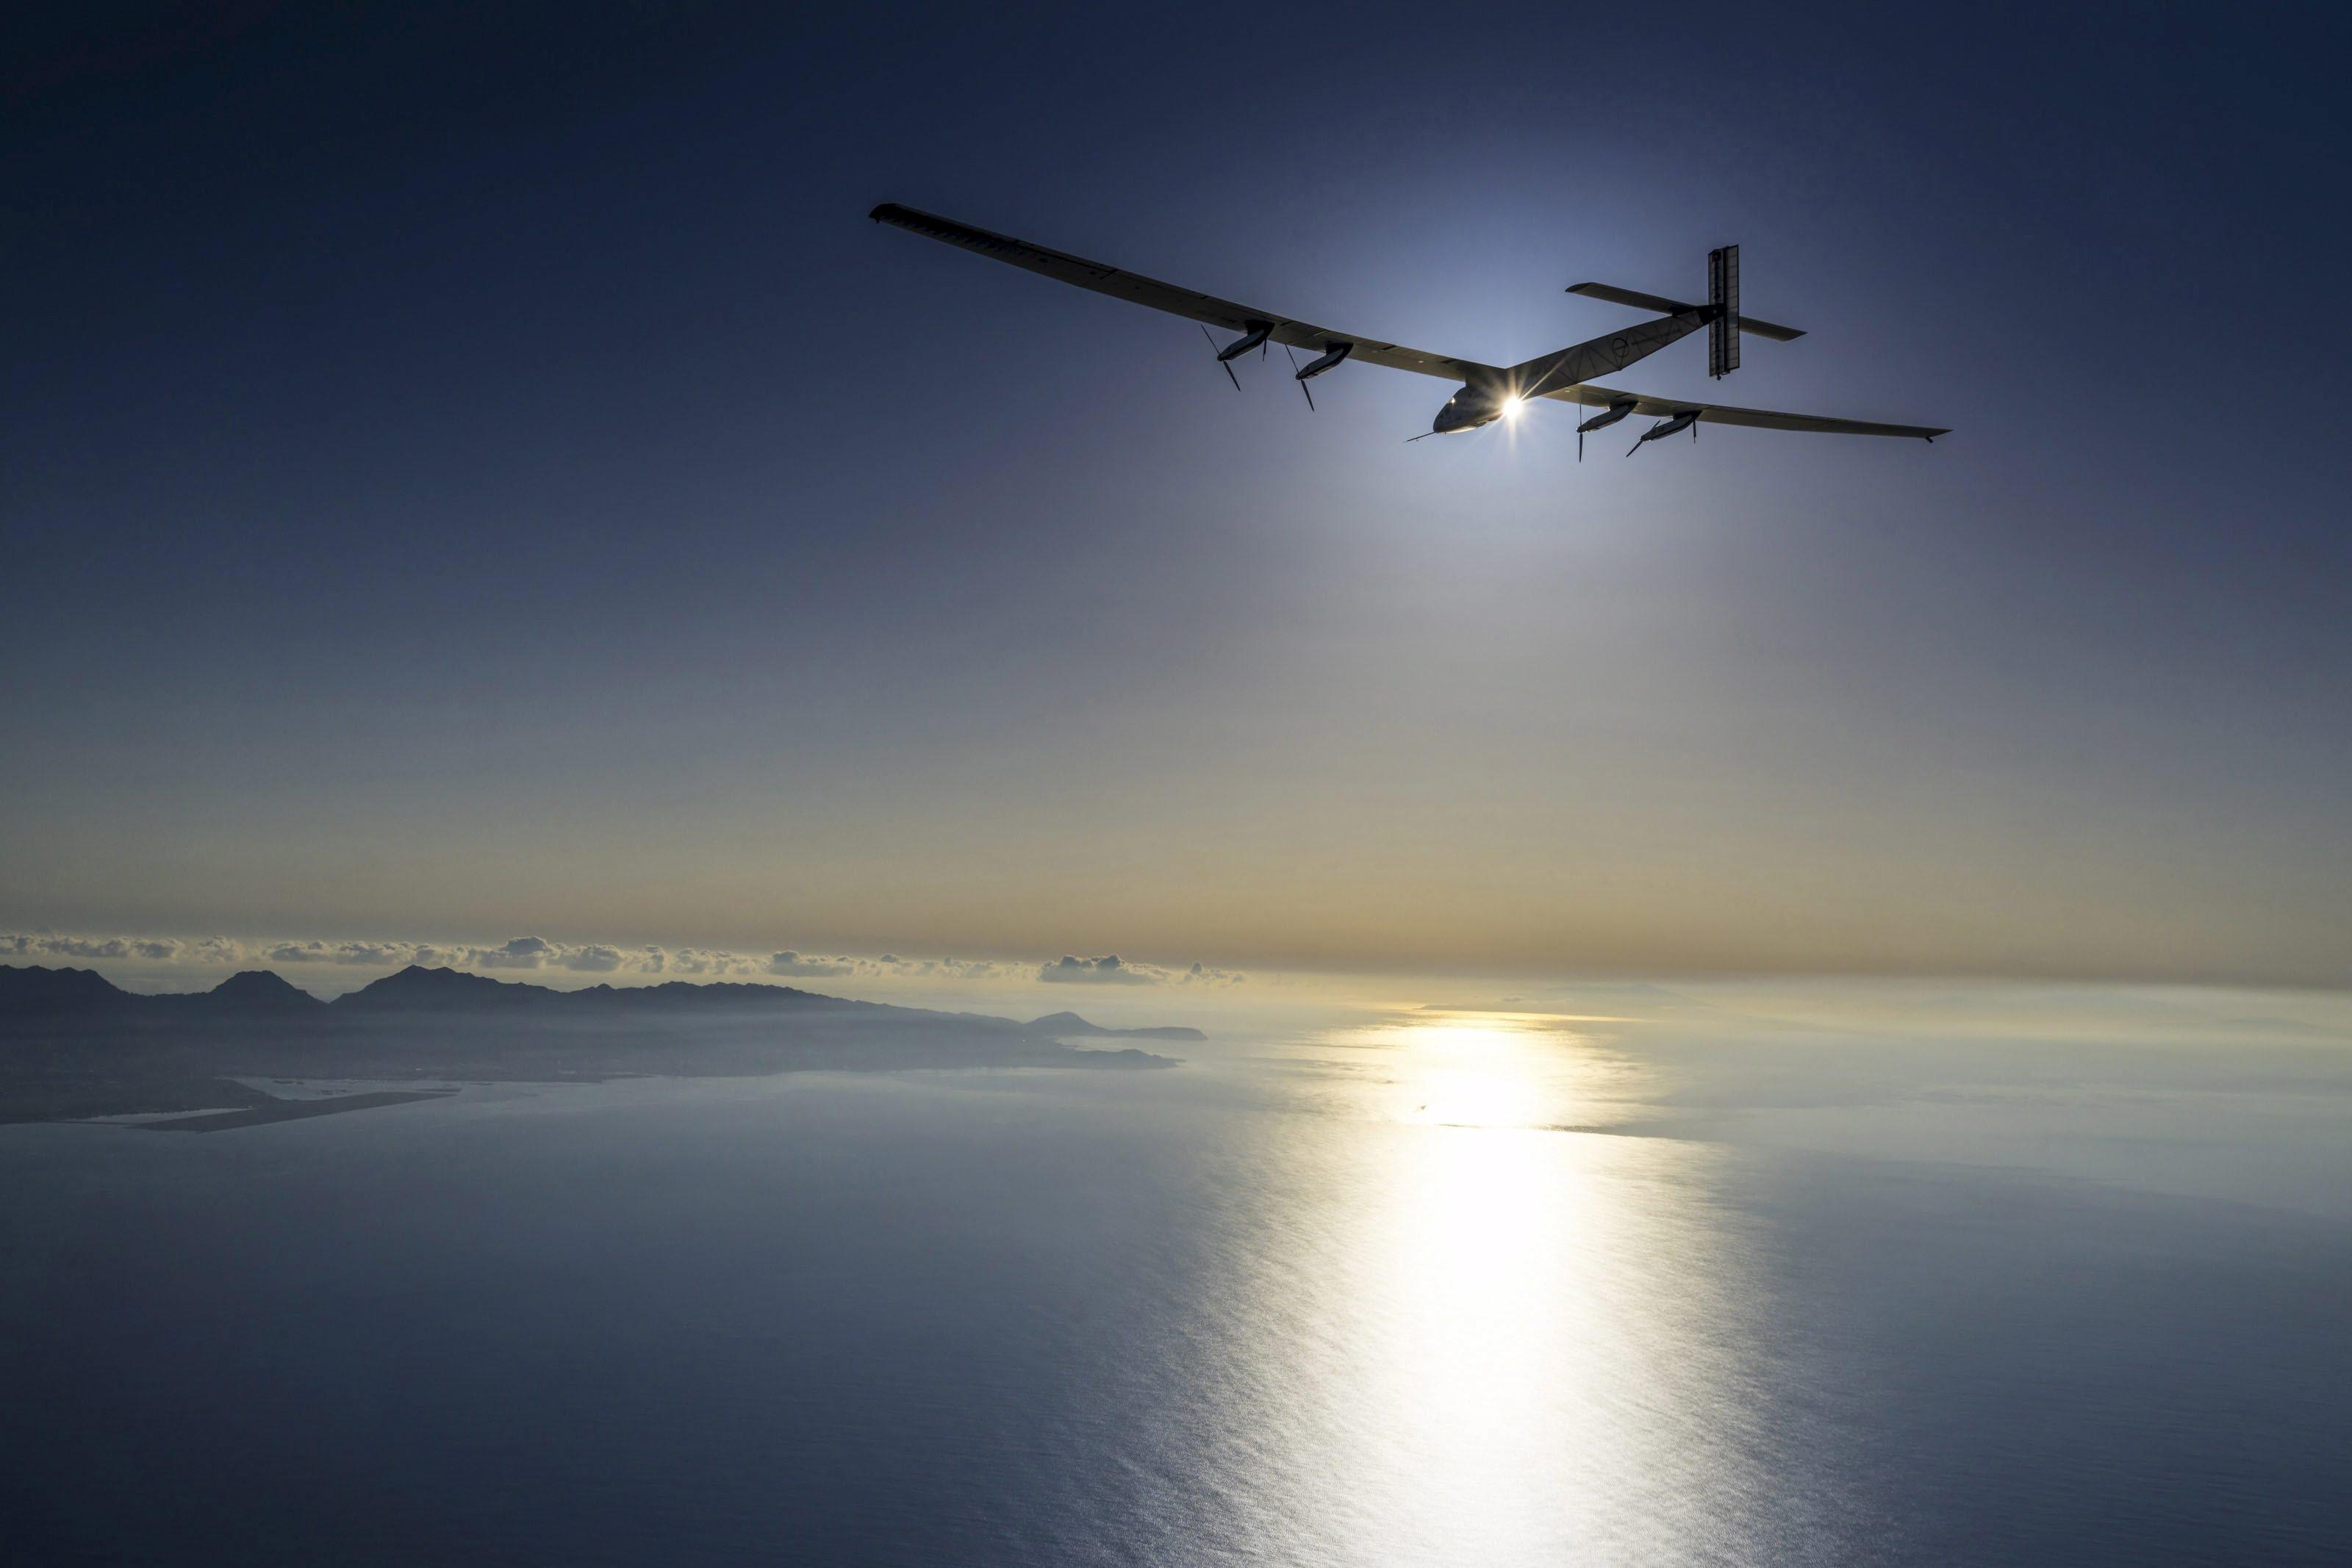 solar impulse 2 completes phoenix san francisco leg of round the world flight